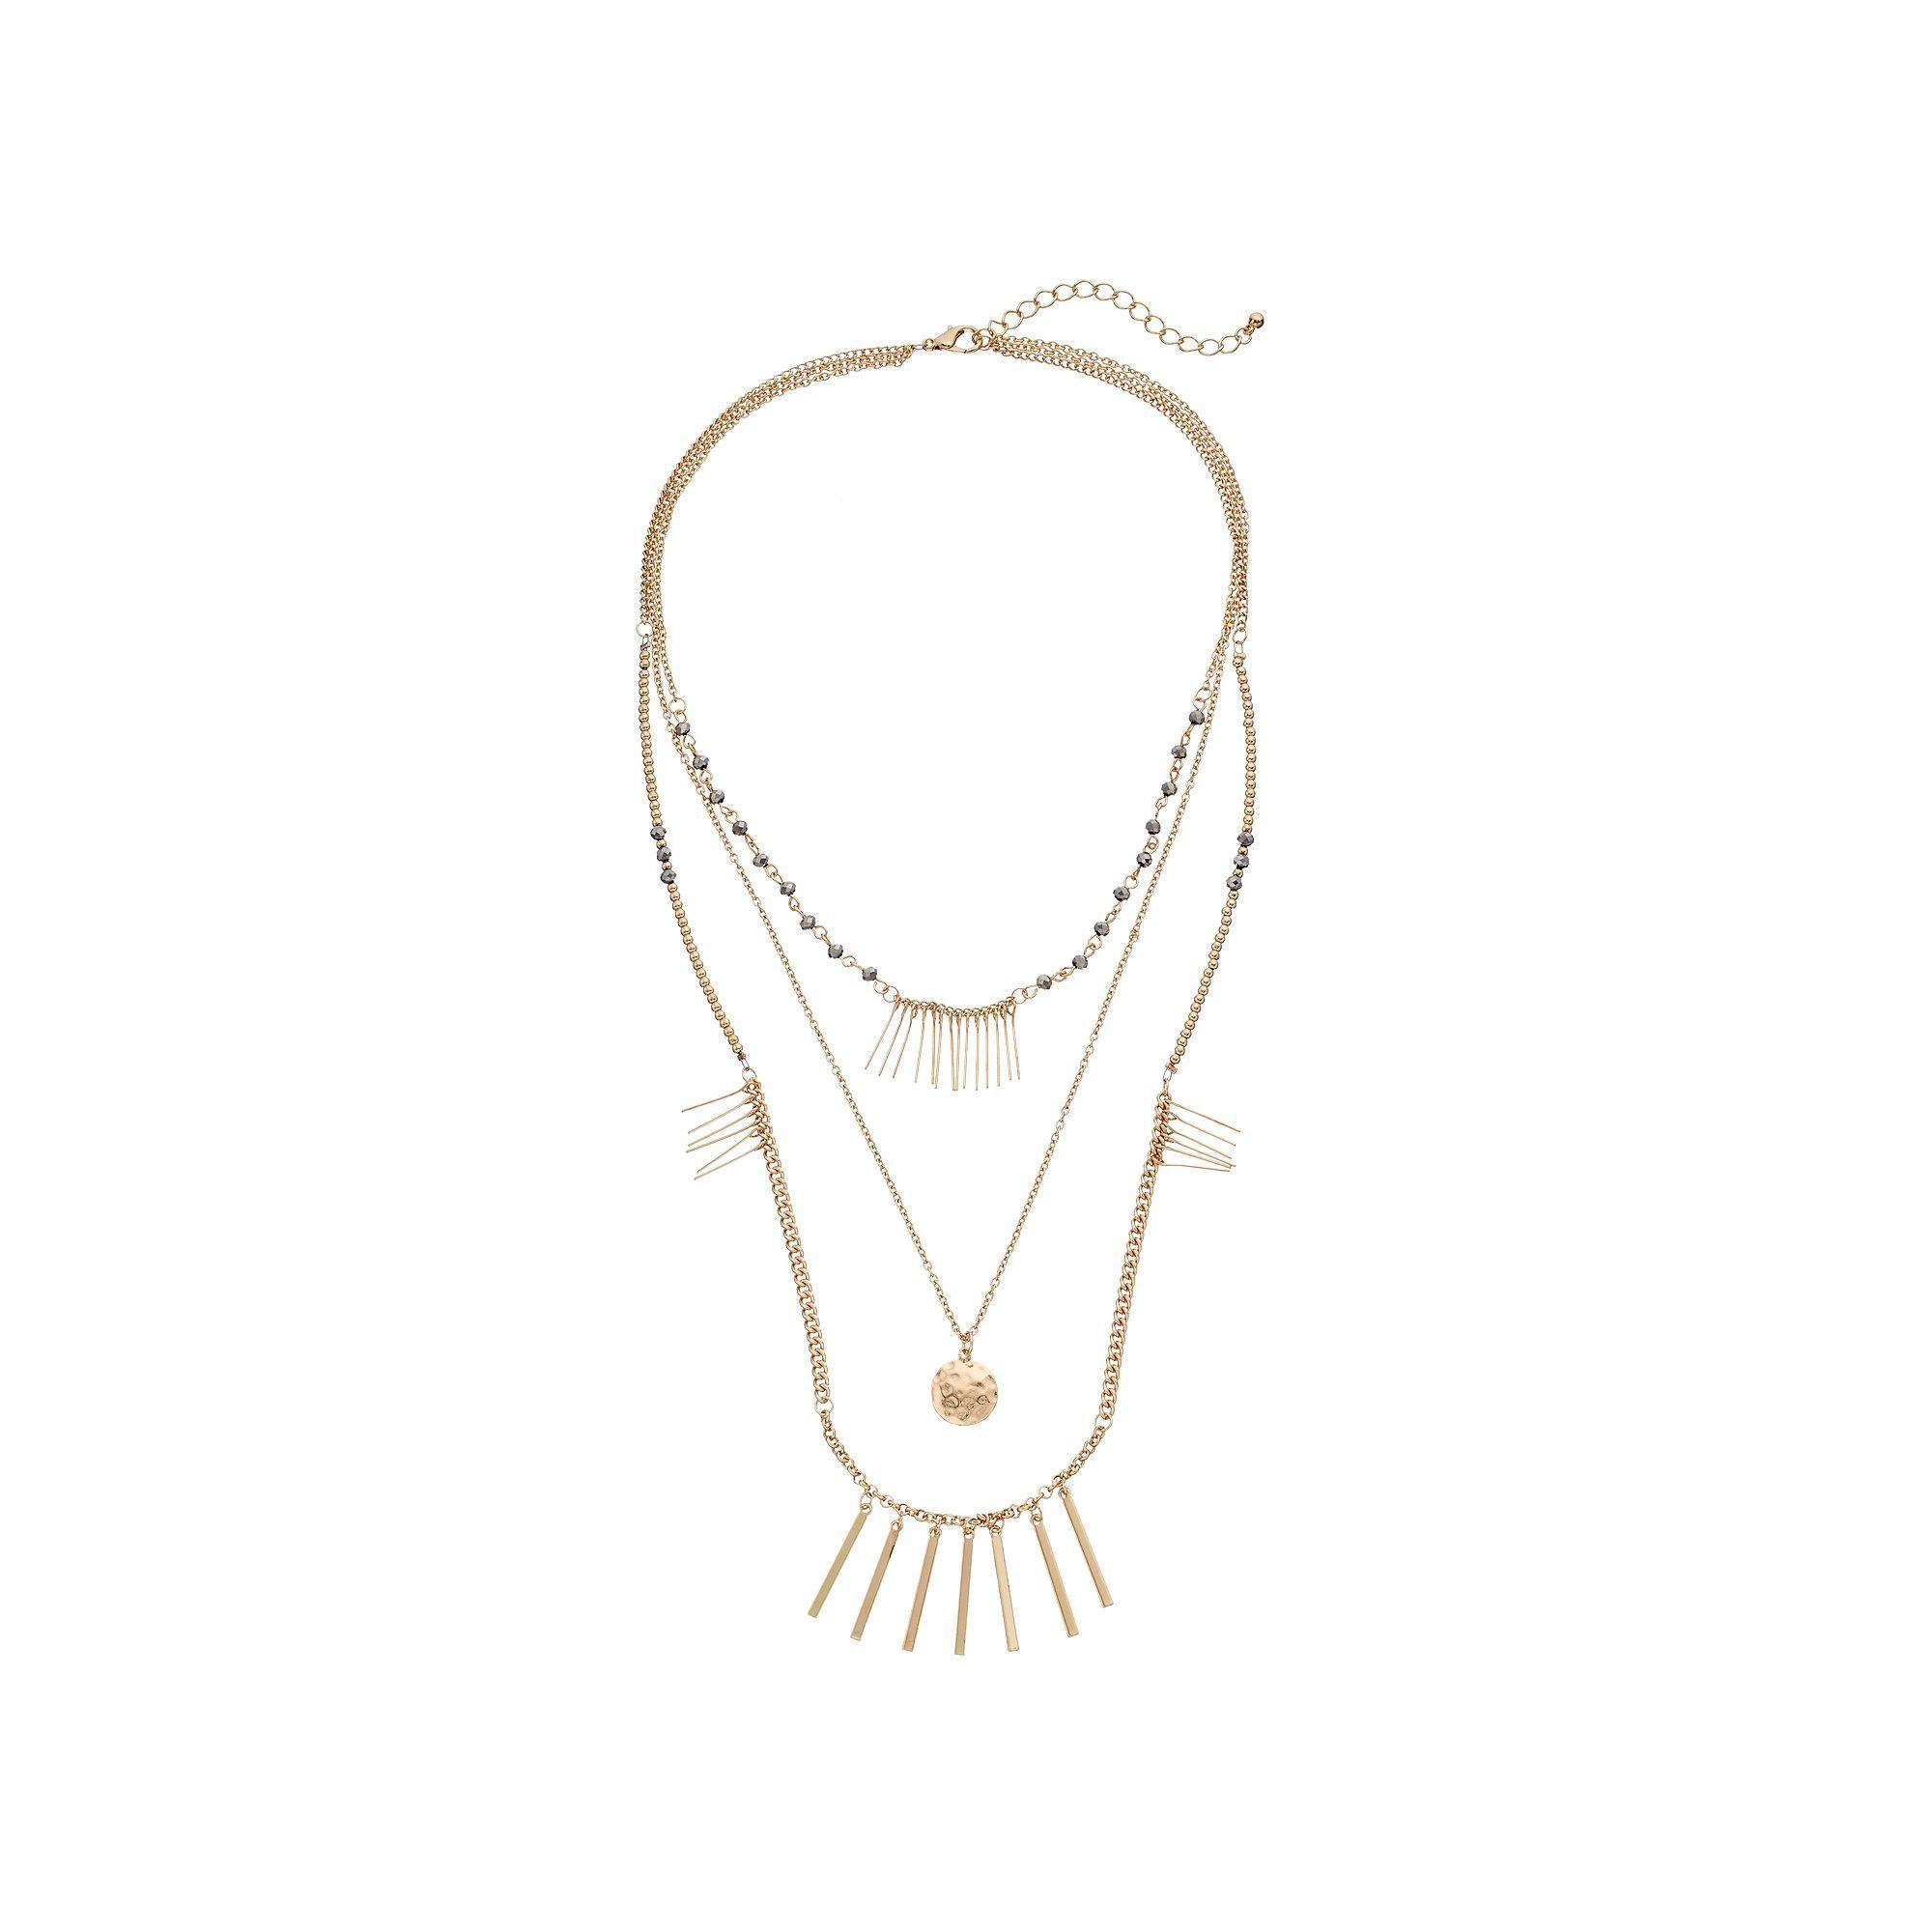 Hammered Disc & Bar Fringe Layered Necklace, Women's, Gold